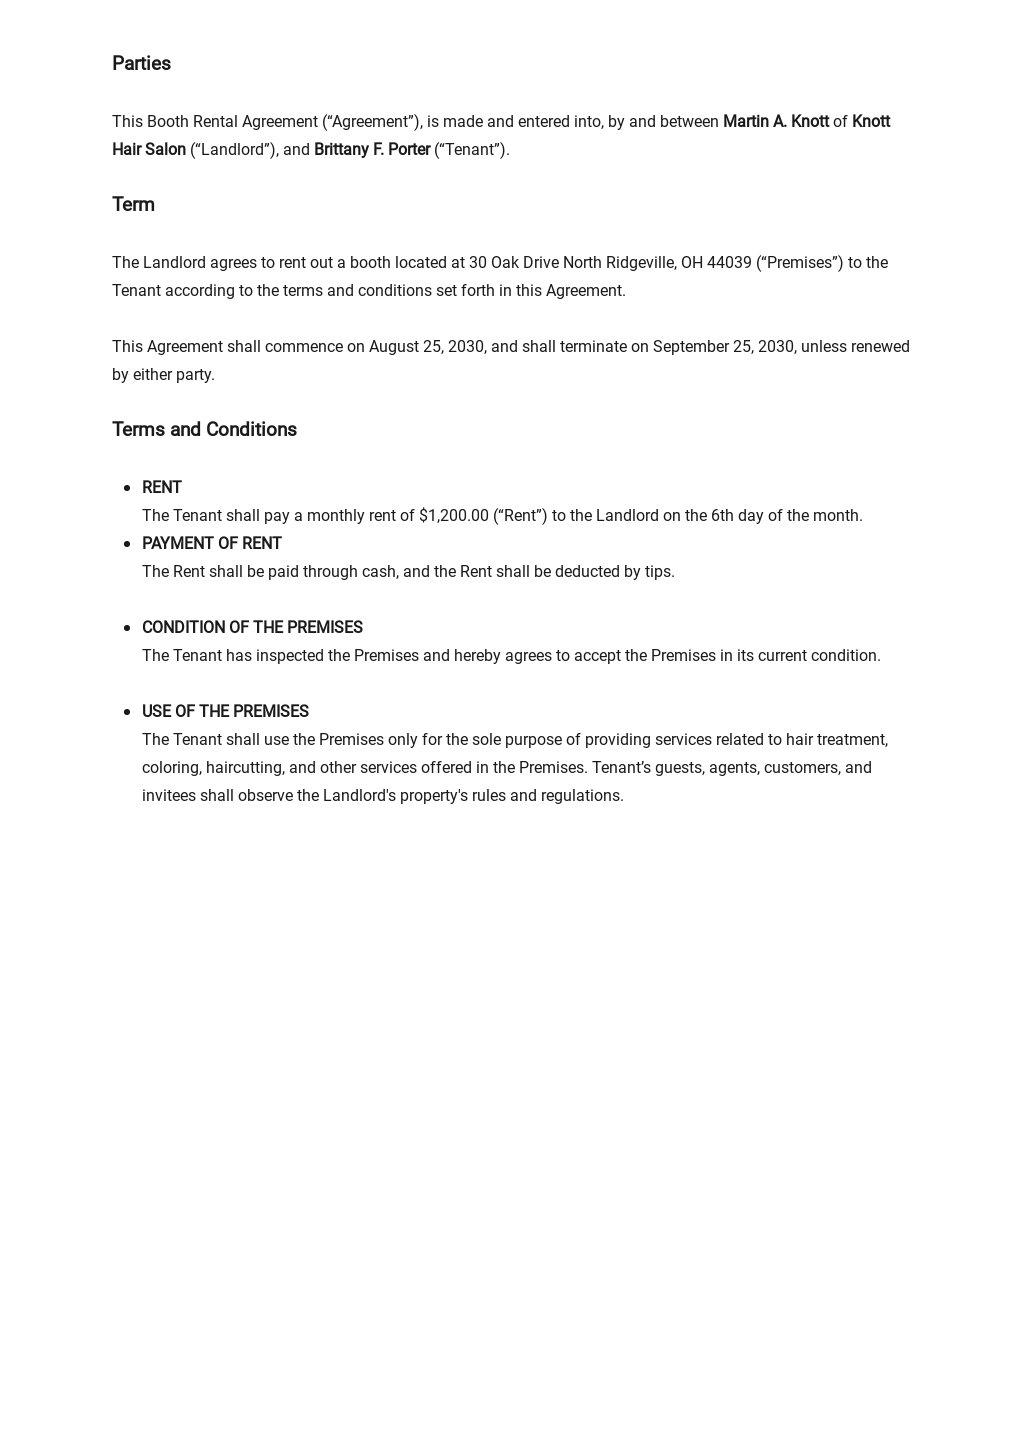 Sample Booth Rental Agreement Template 1.jpe